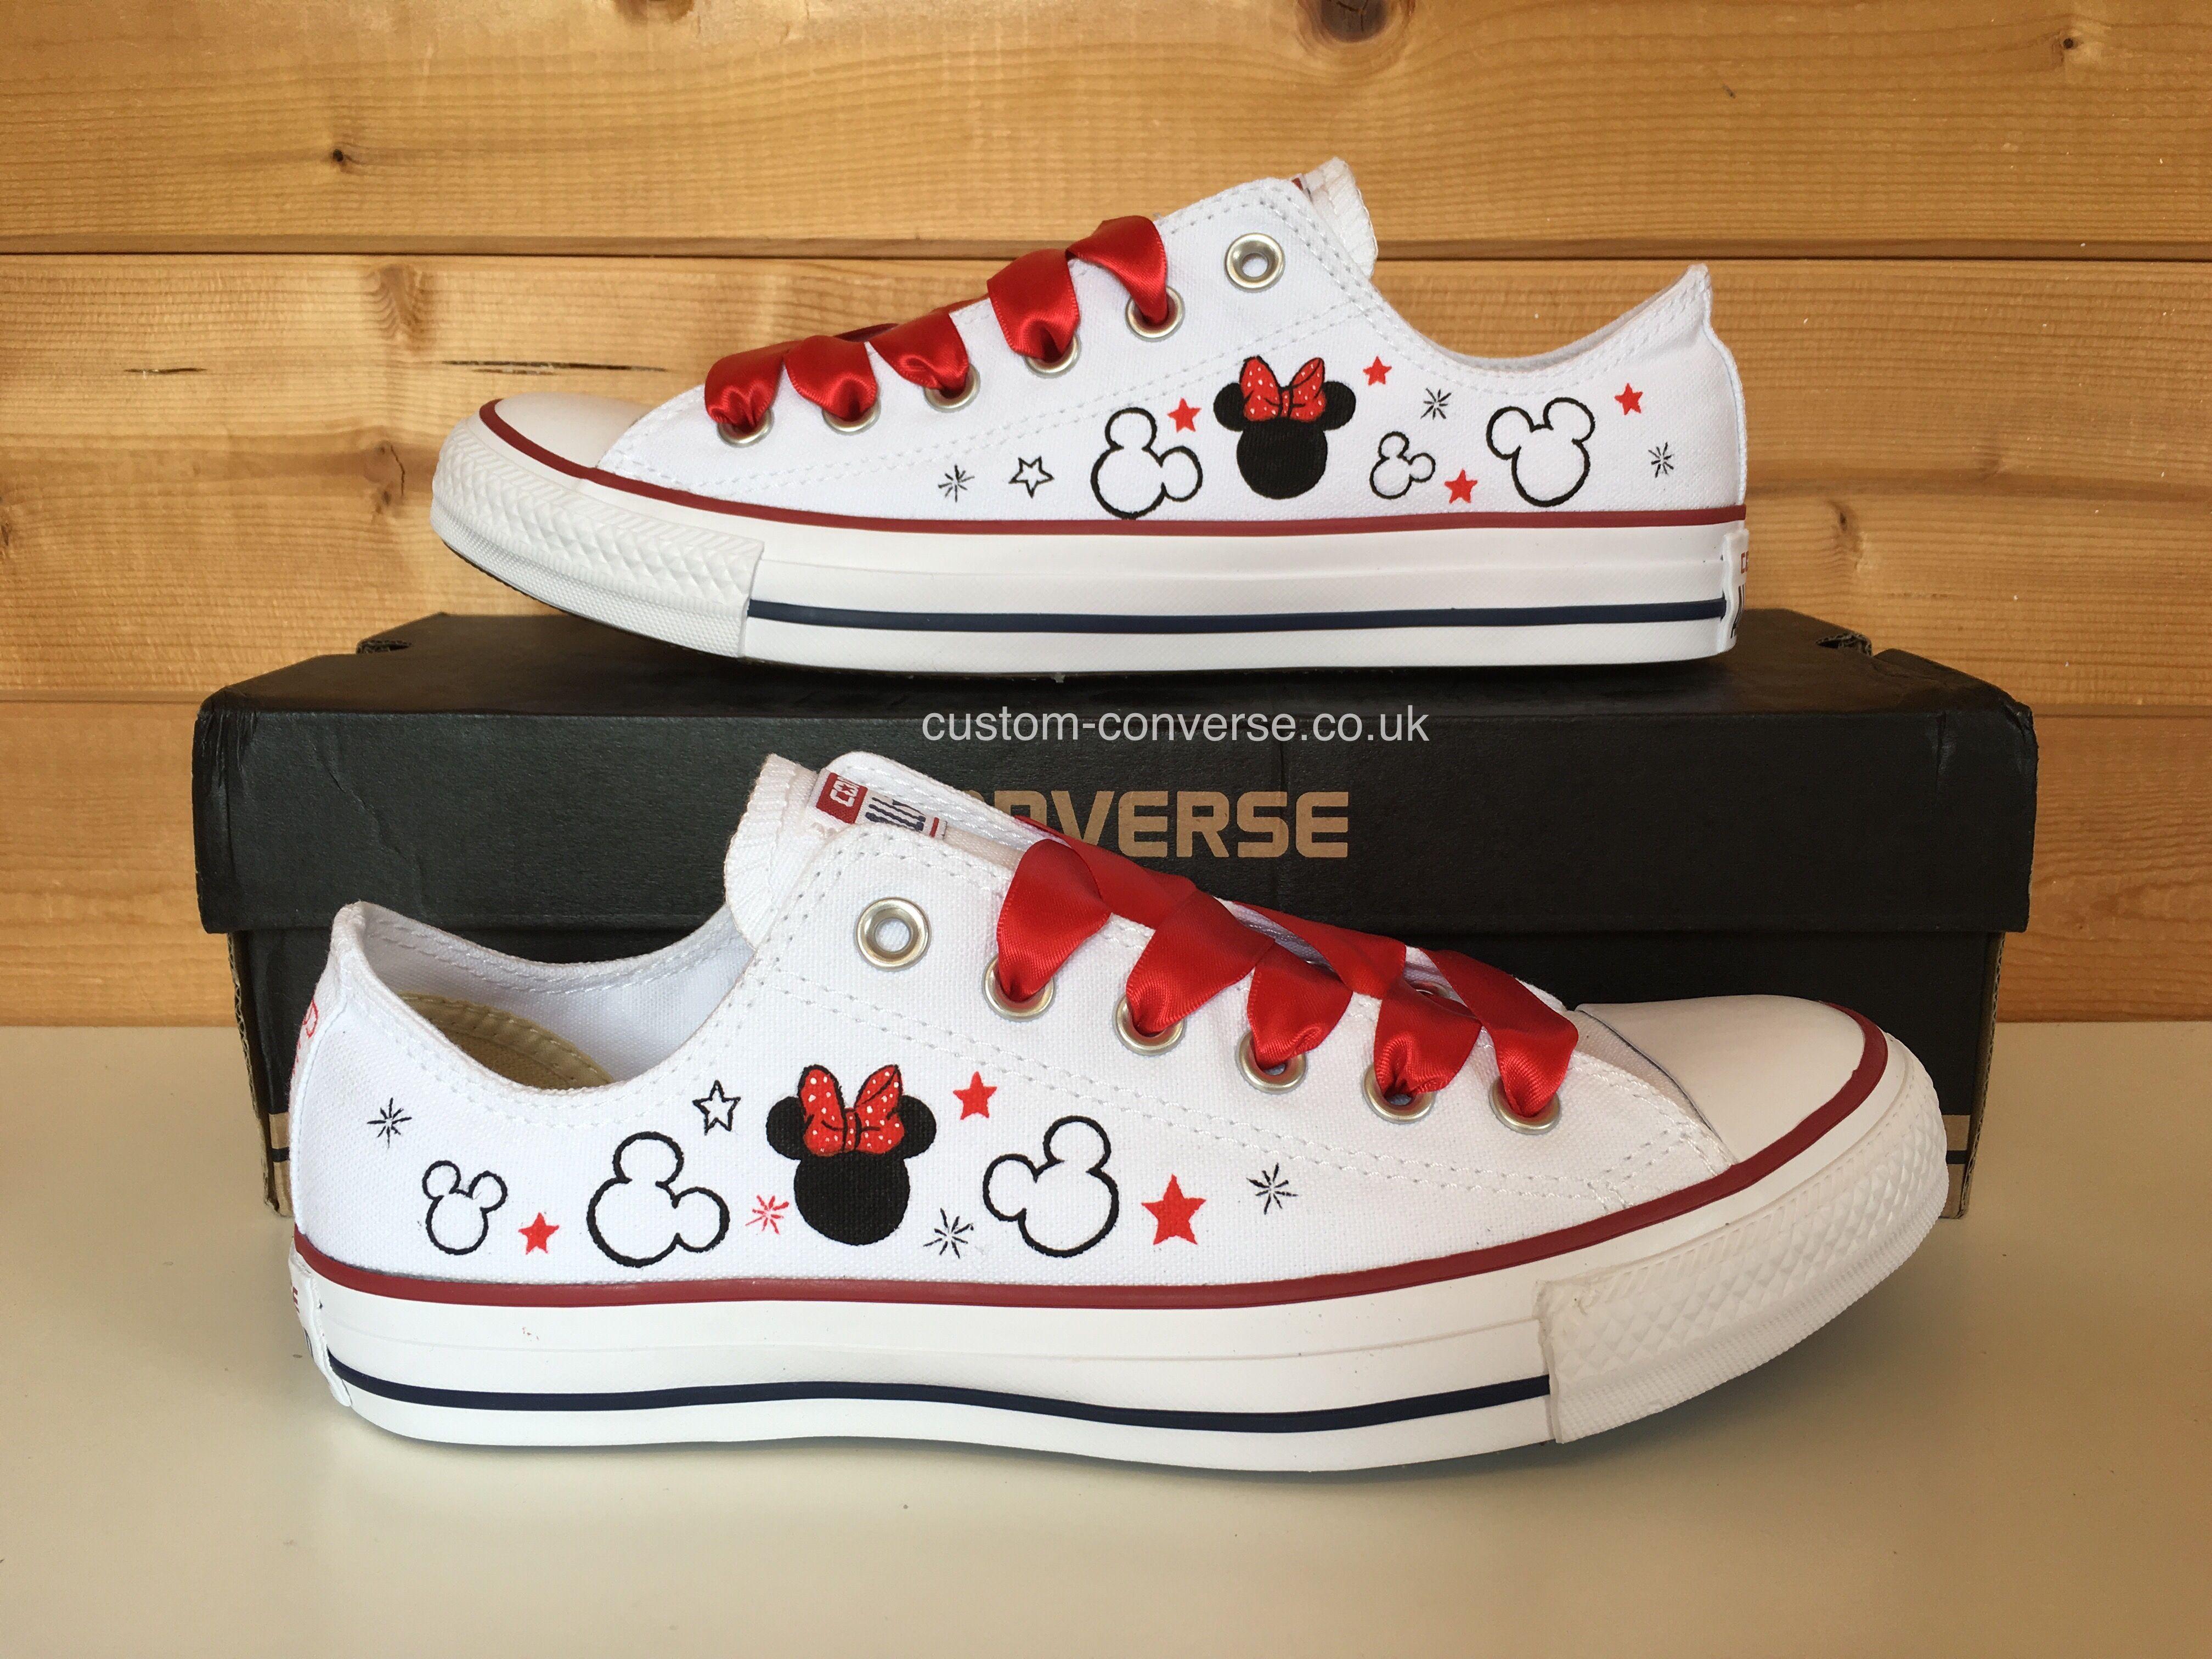 chaussure converse disney